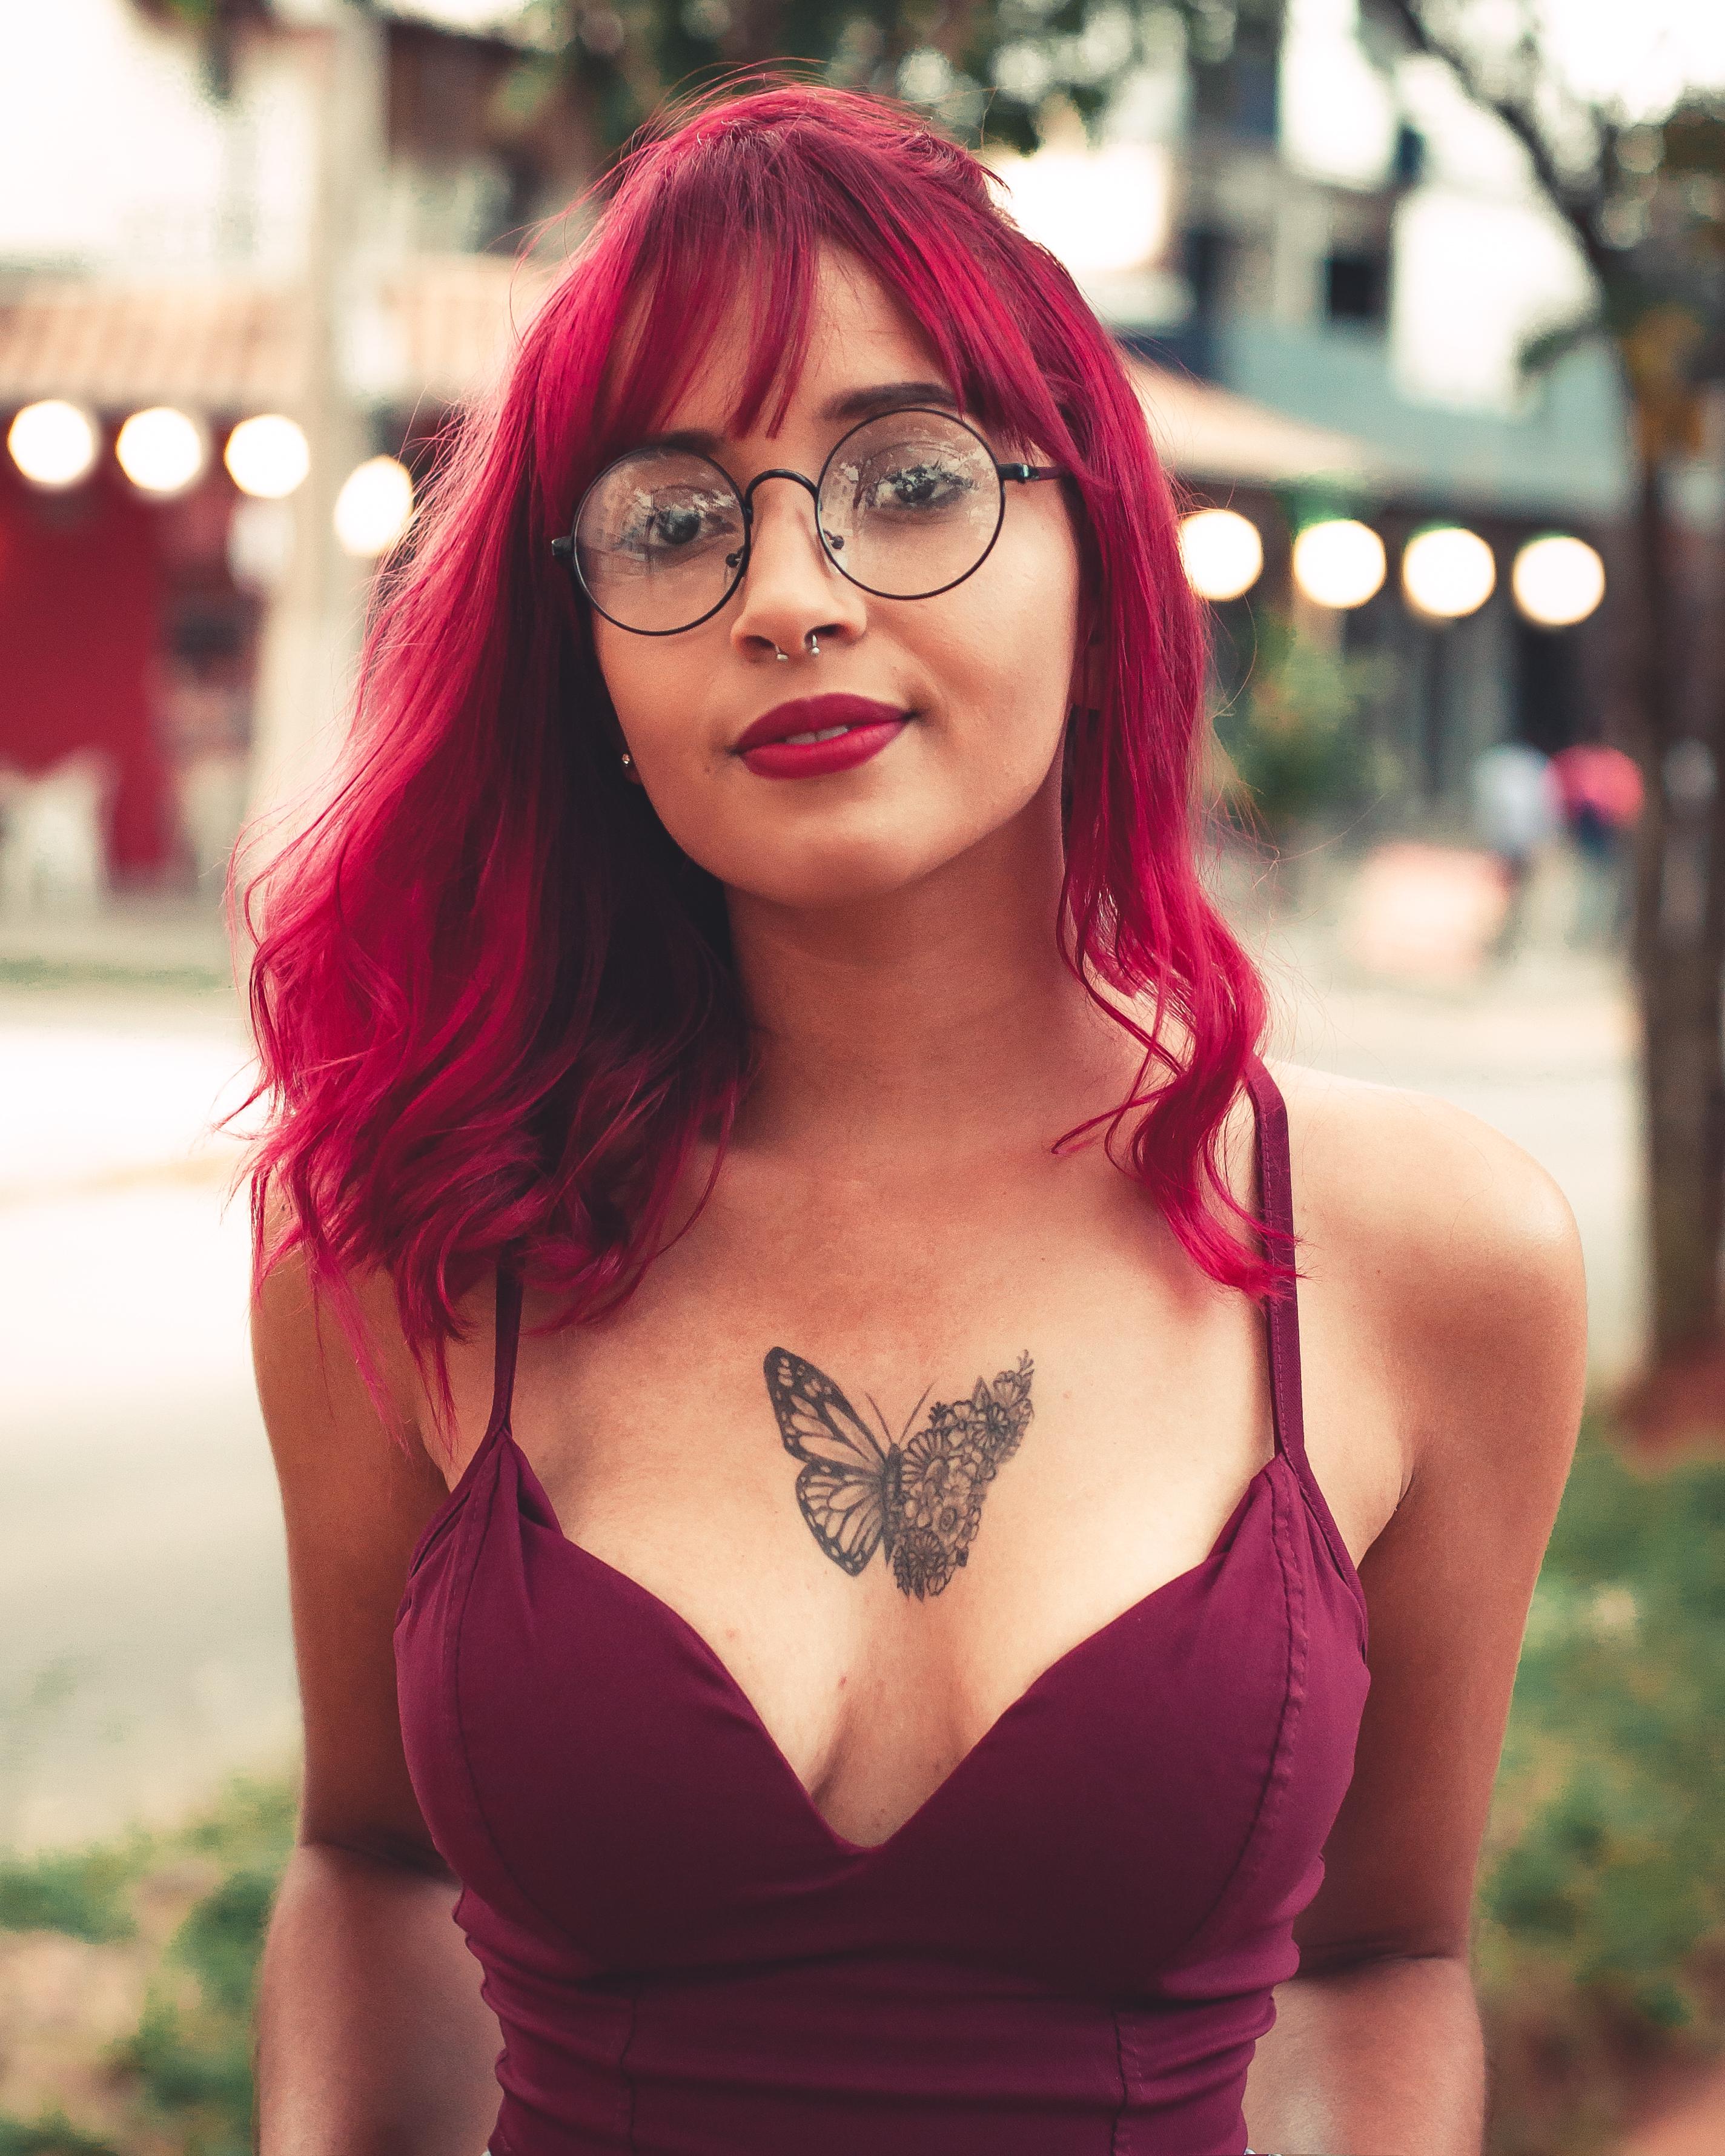 Sexe à Boulay Moselle 57220 Avec Femme Plan Cul